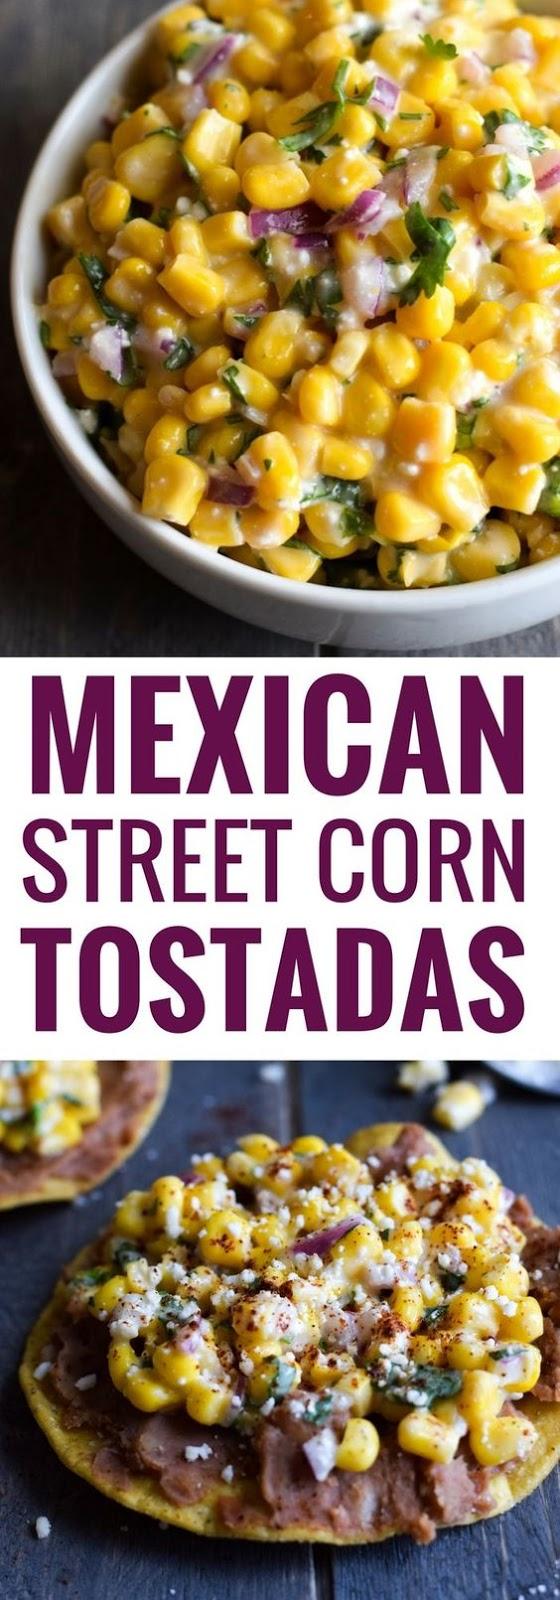 Mexican Street Corn Tostadas